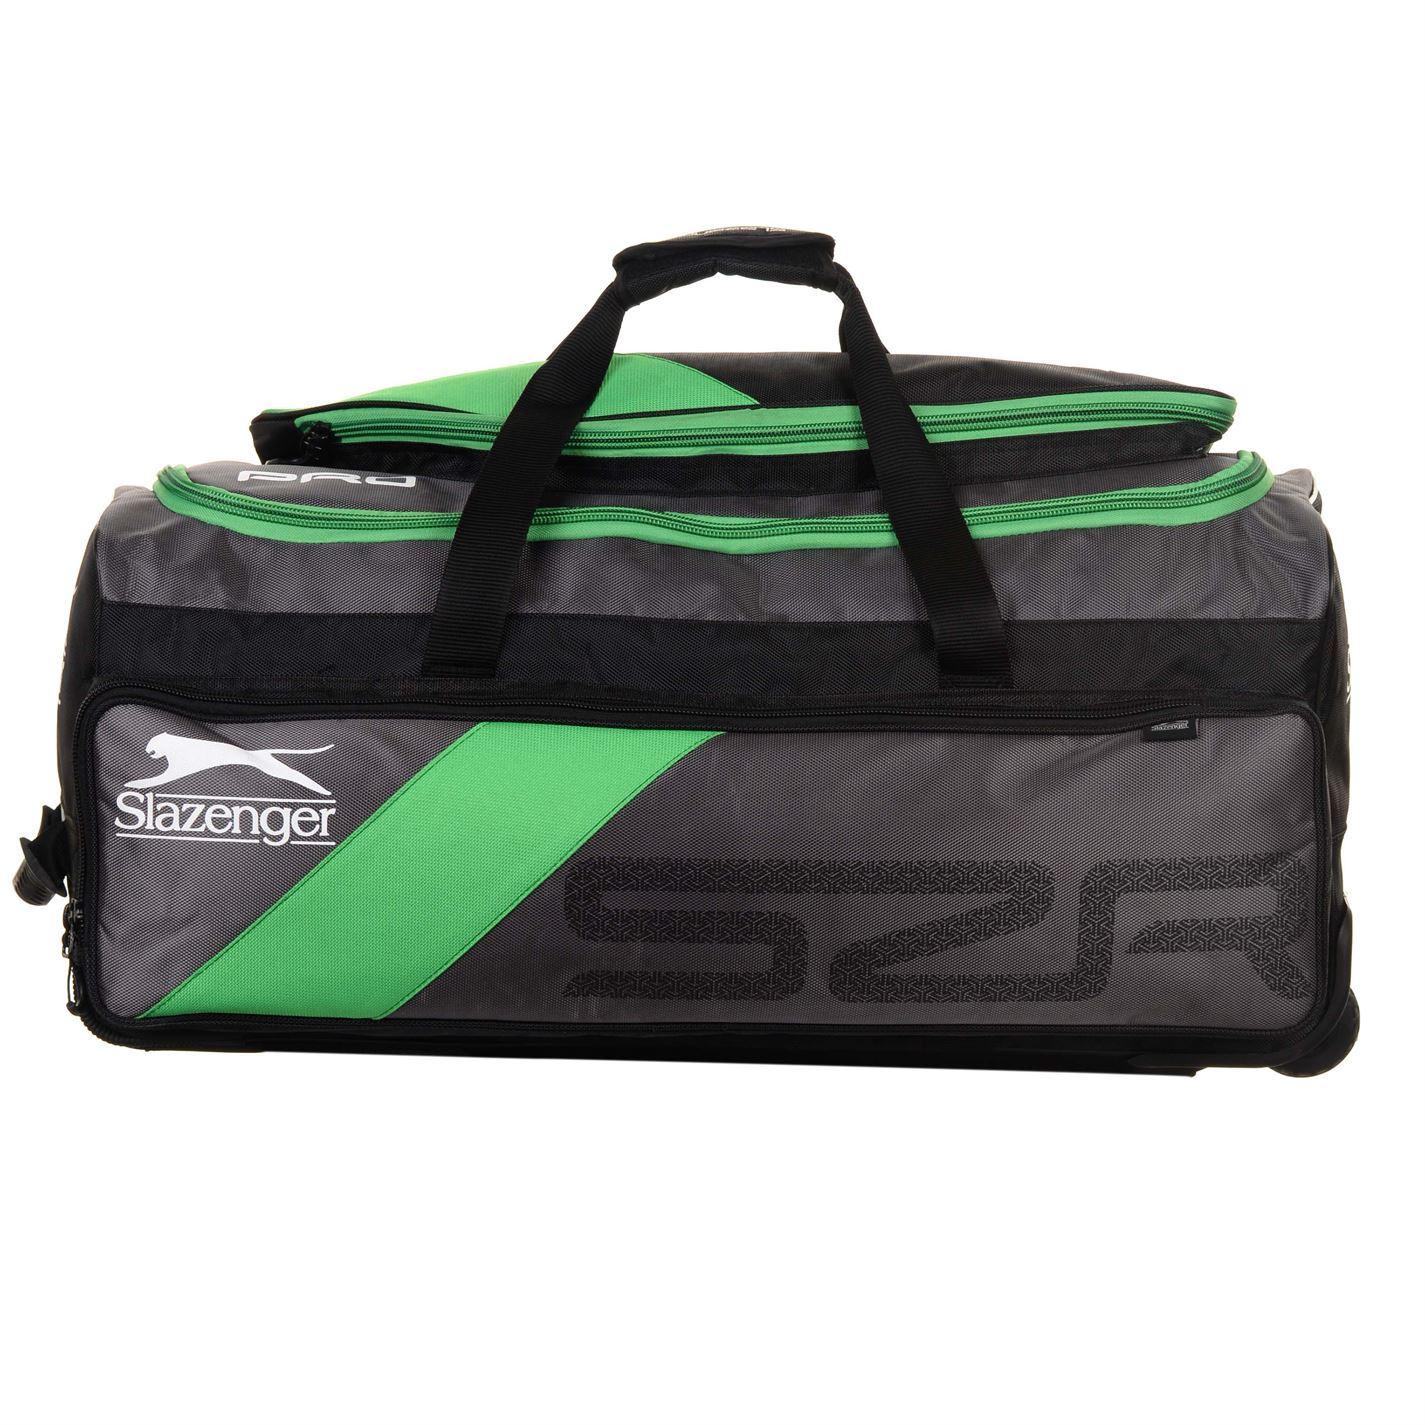 346979f99d ... Slazenger V-Series Pro Wheelie Cricket Bag Black/Green Bat & Pads  Holdall Case ...